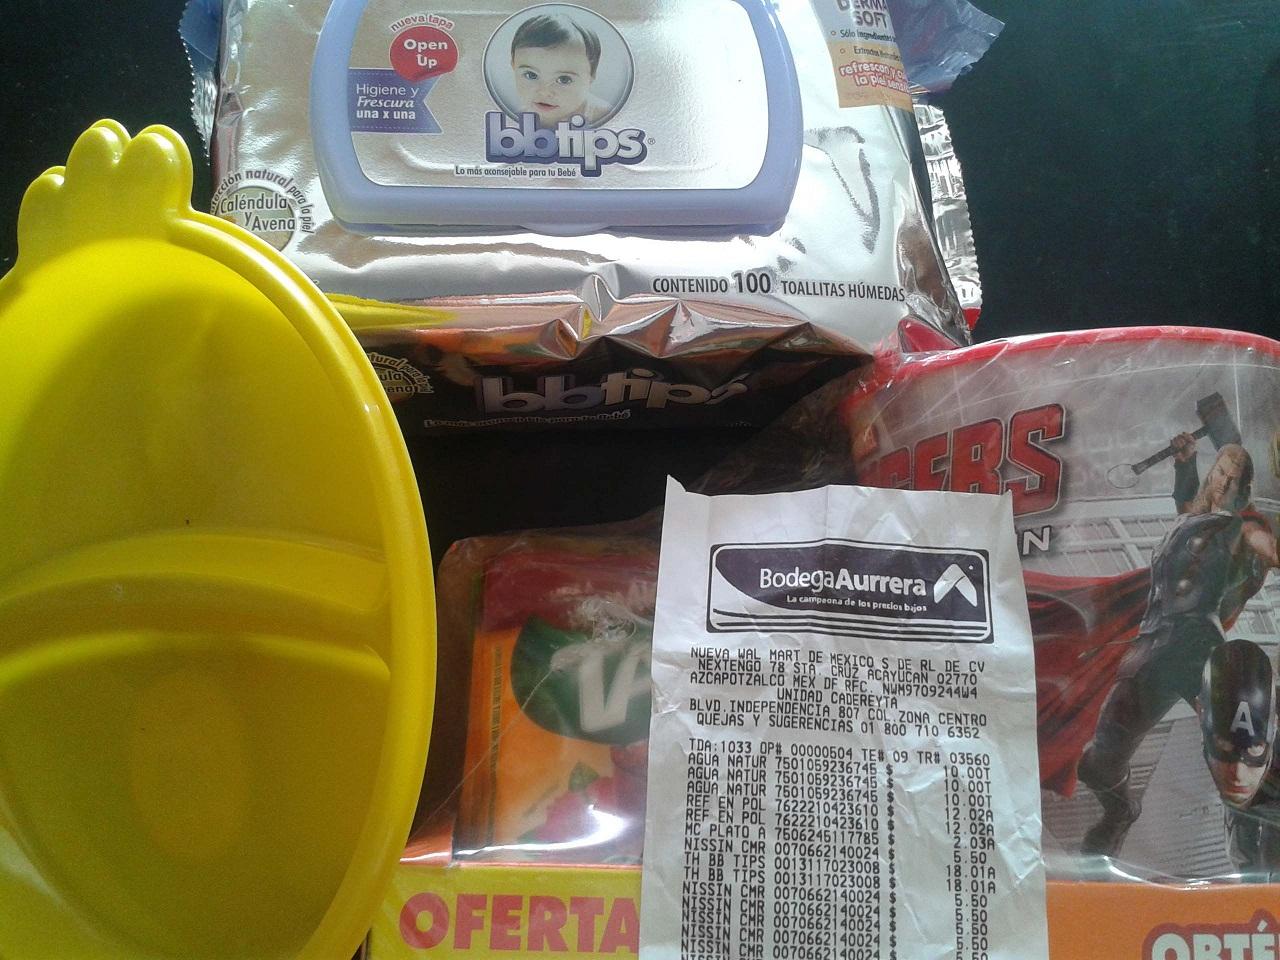 Bodega Aurrerá: 10 Tang + vaso Avengers a $12.02